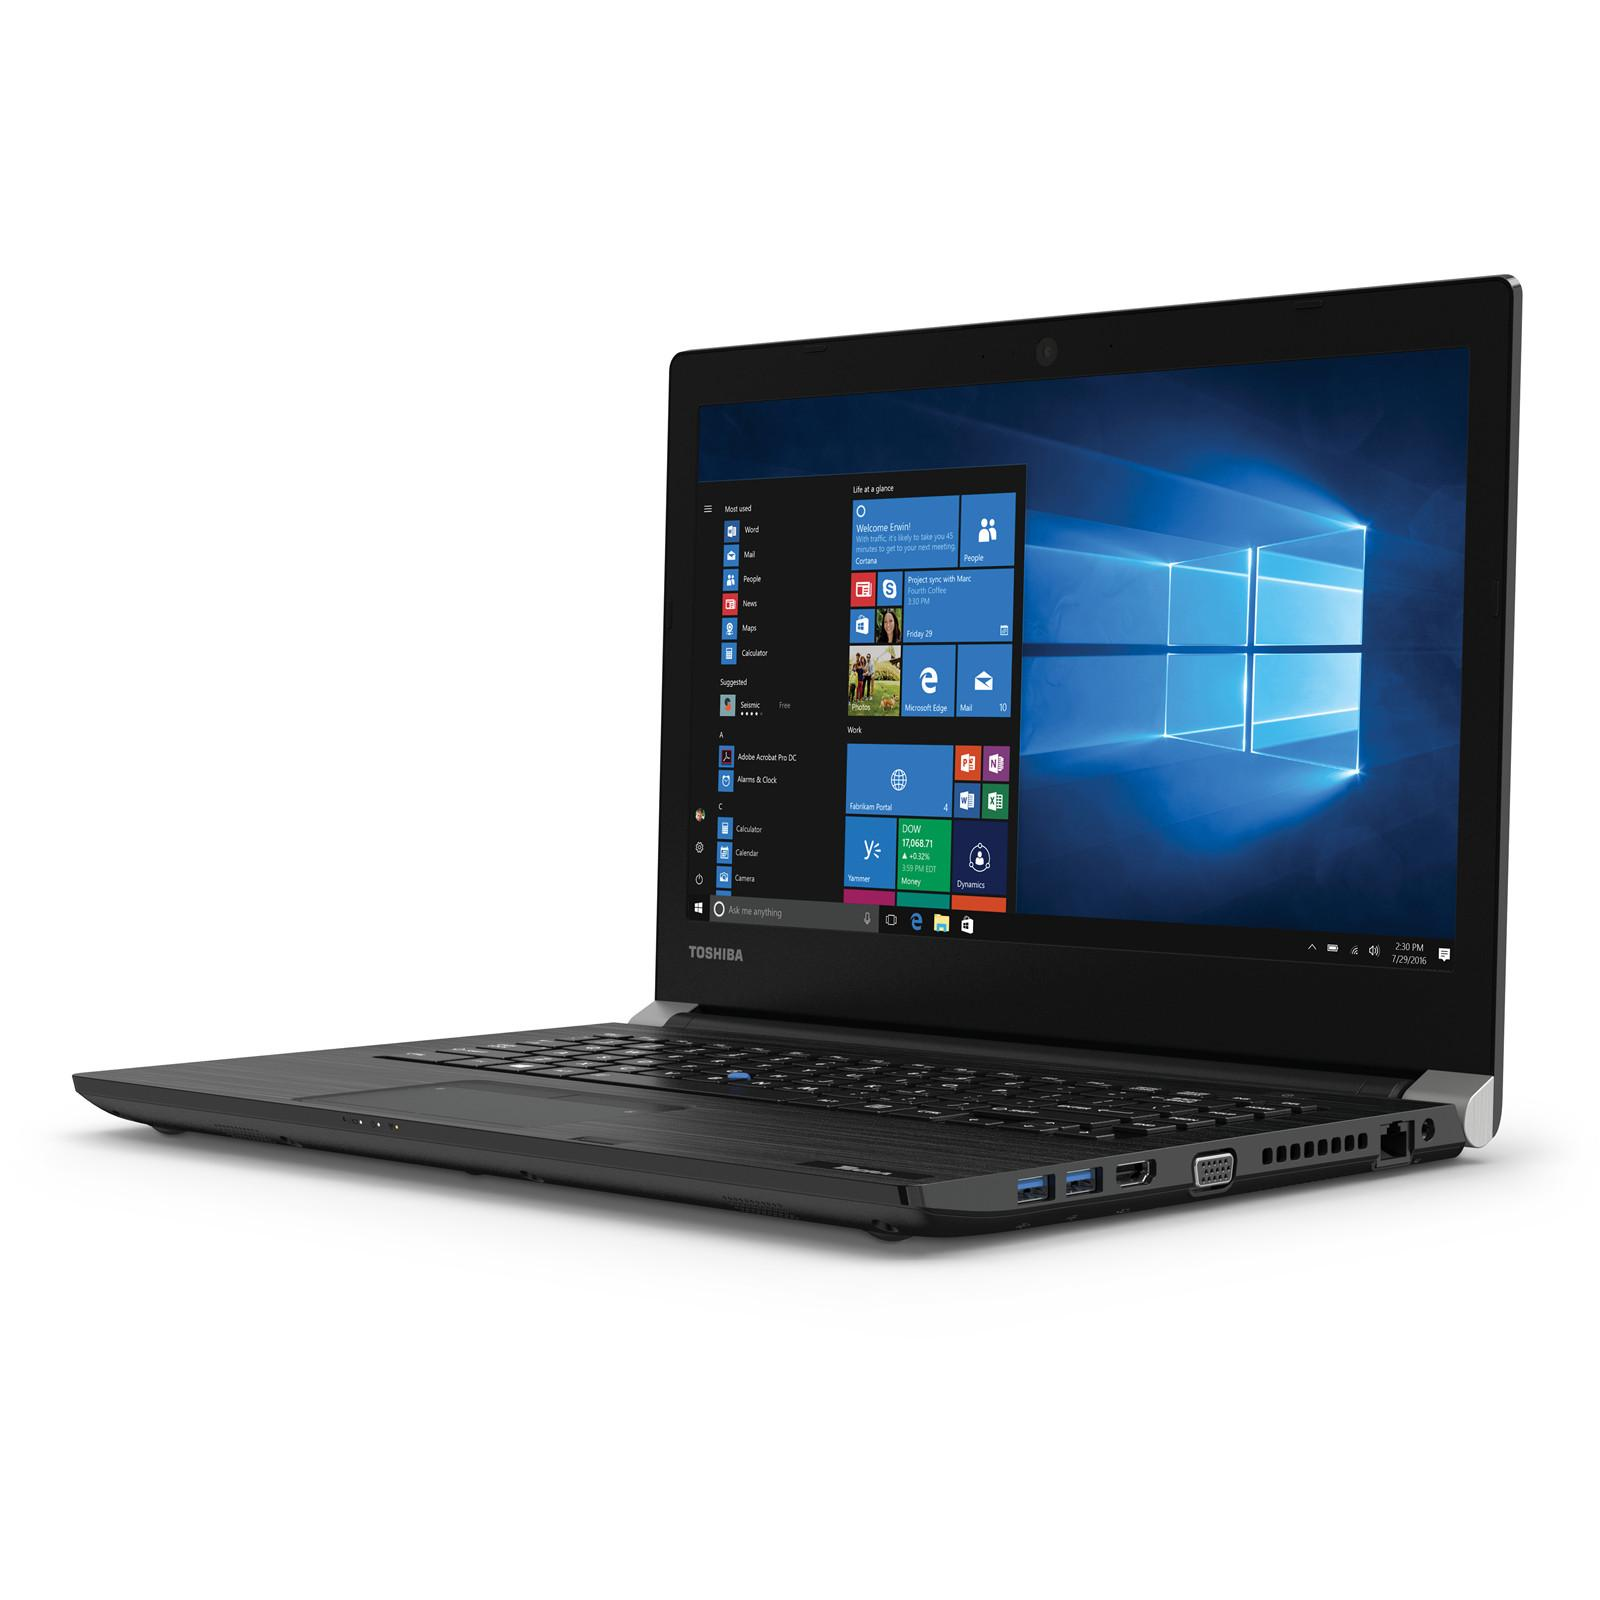 TOSHIBA DynaBook Pro C40H Intel Core i3-1005G1 4GB 256GB 14″WIN 10